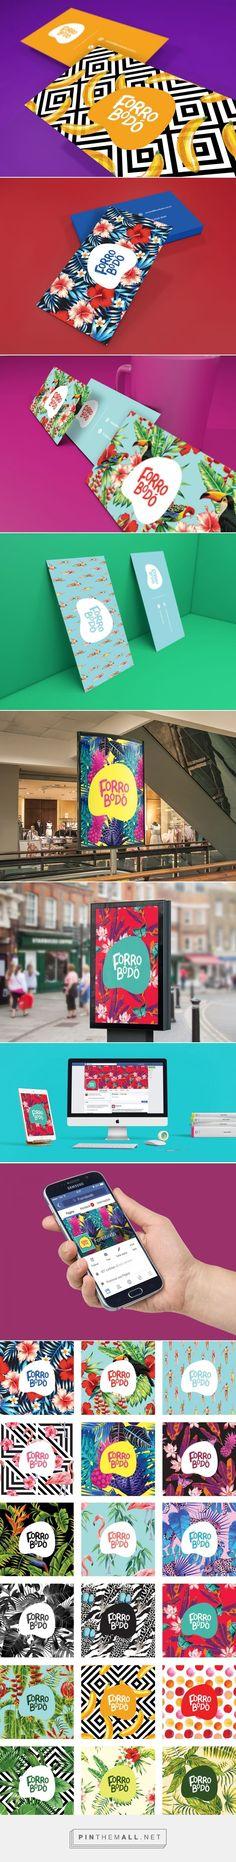 Colorful Branding for Forrobodó - A Brazilian Store by Felipe Bizzi: